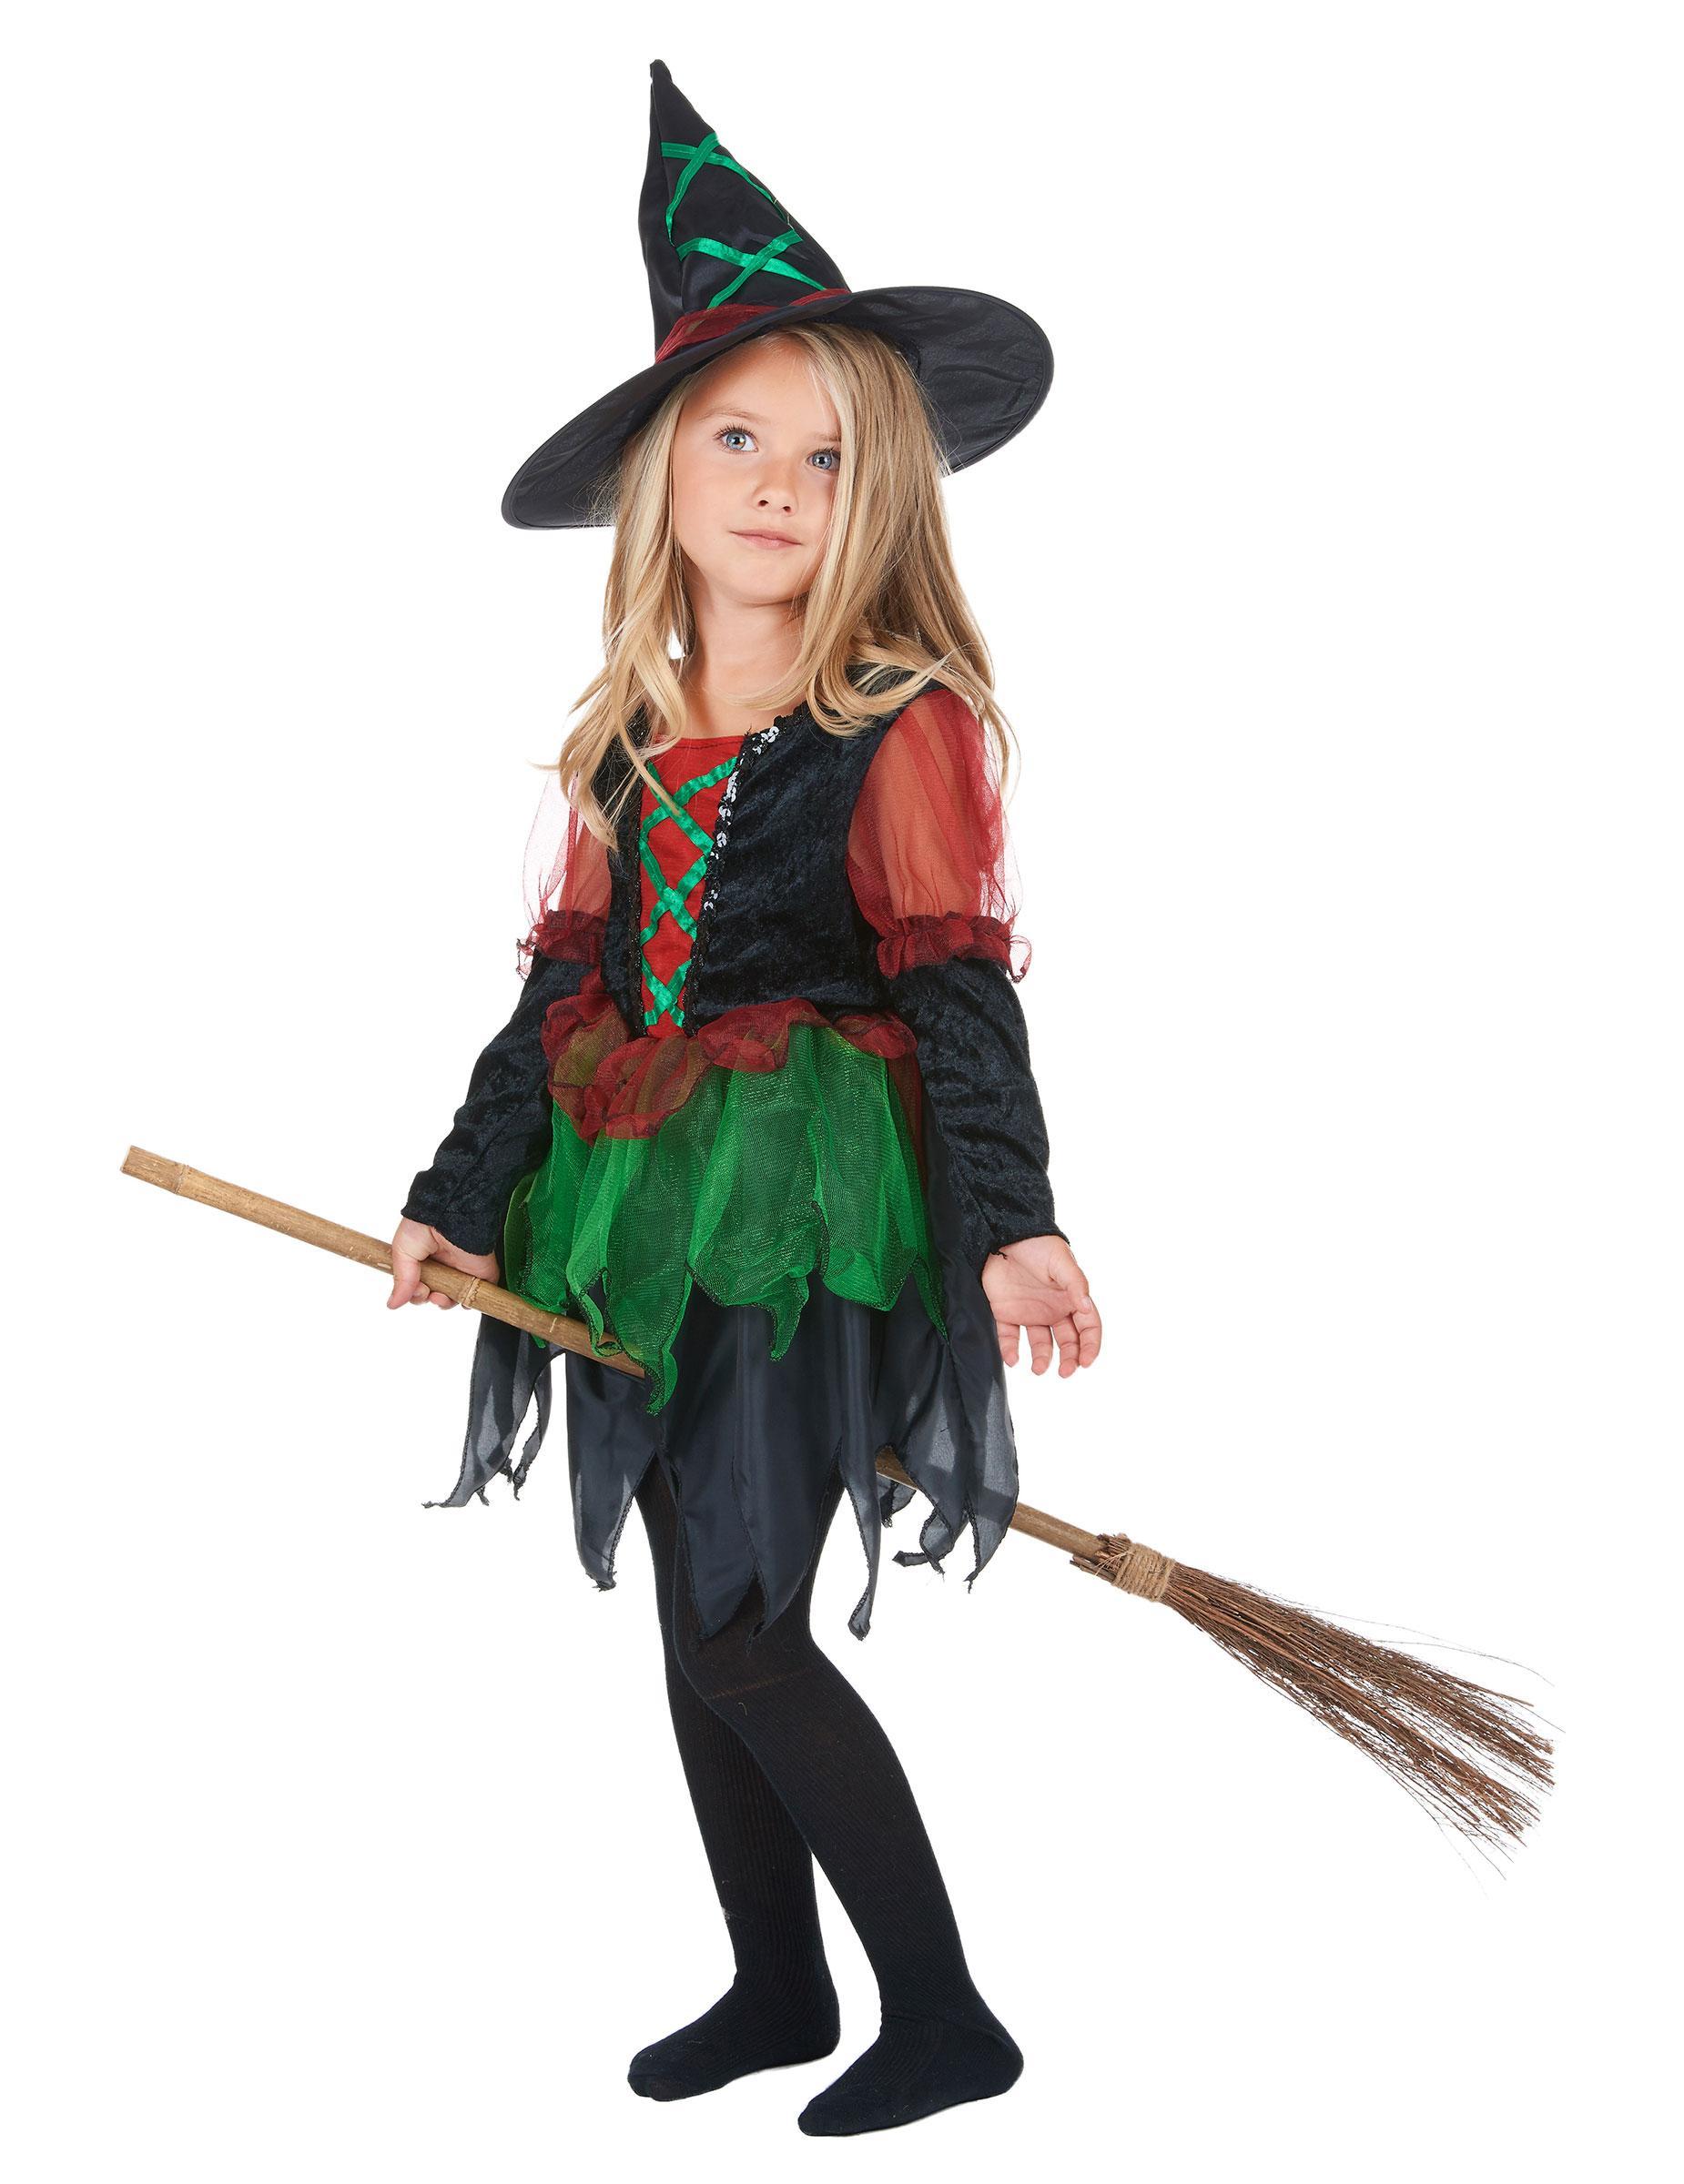 Disfraz de bruja del bosque para ni a ideal para halloween - Como pintar a una nina de bruja para halloween ...